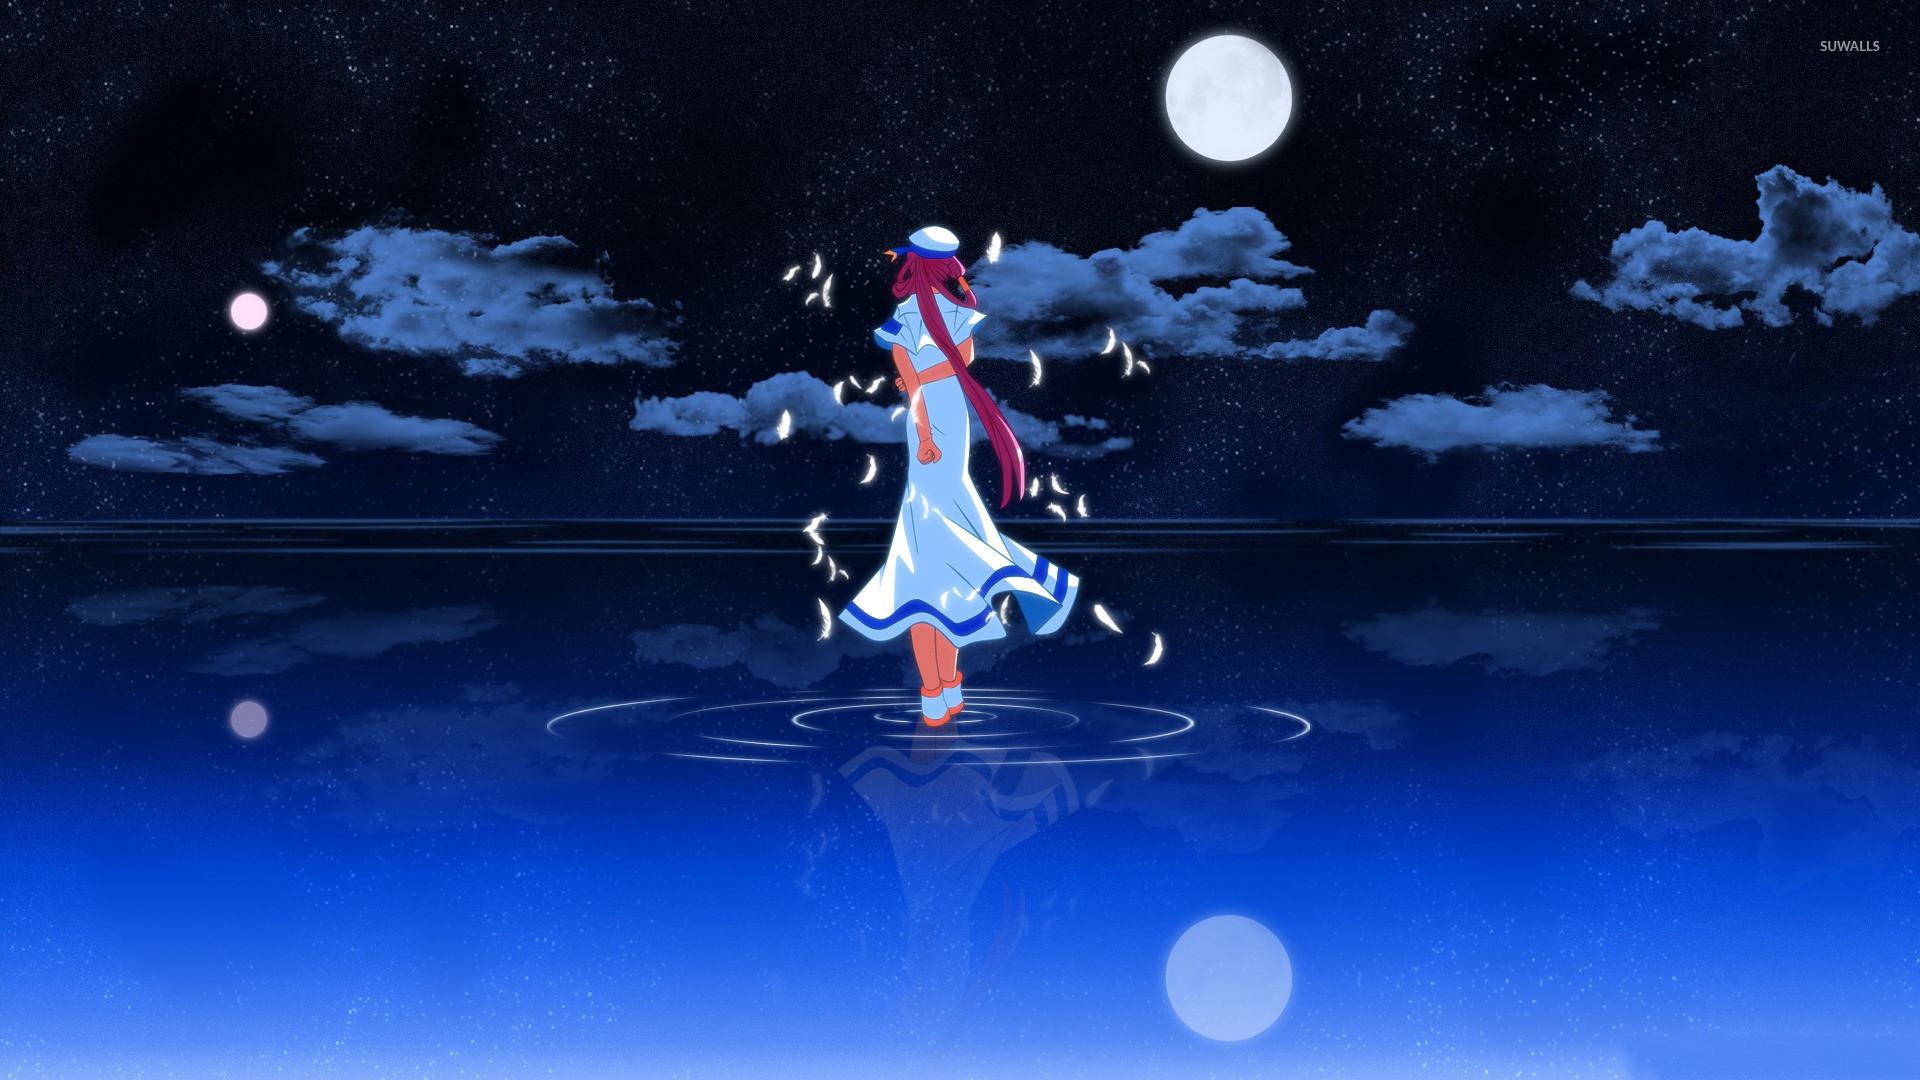 Sailor girl in water wallpaper